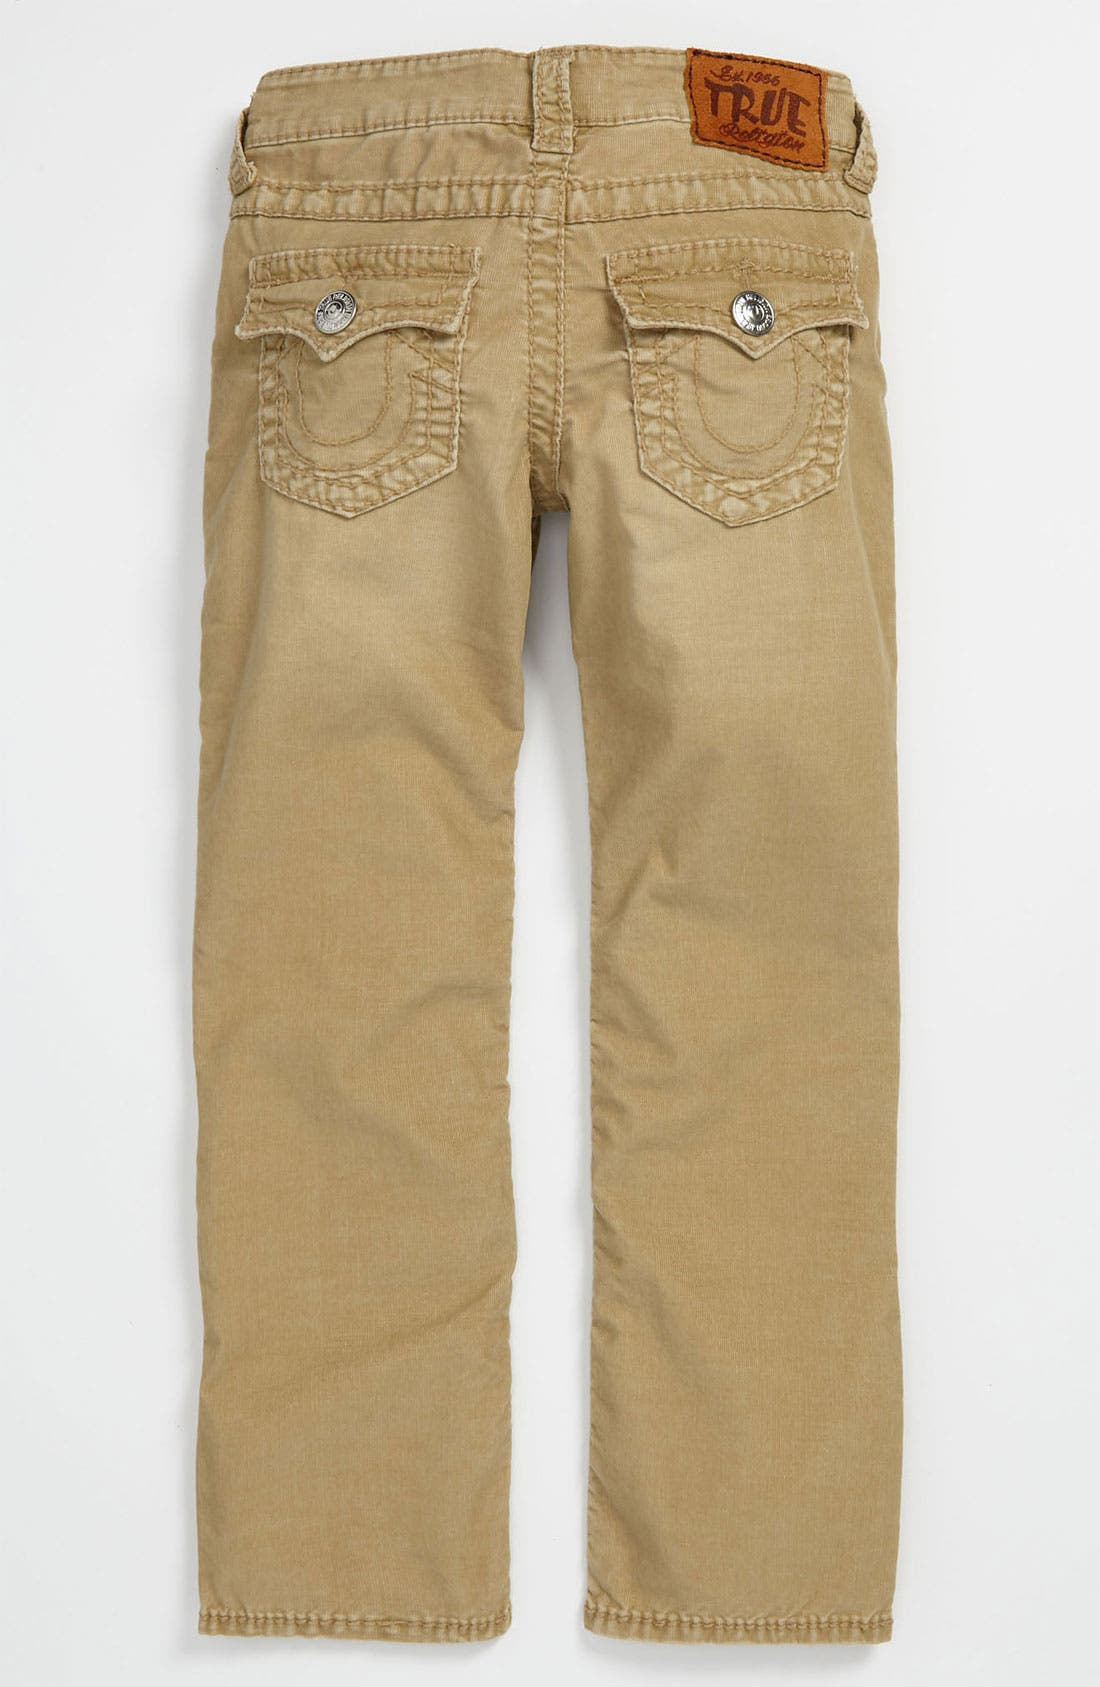 Main Image - True Religion Brand Jeans 'Jack' Straight Leg Corduroy Jeans (Big Boys)